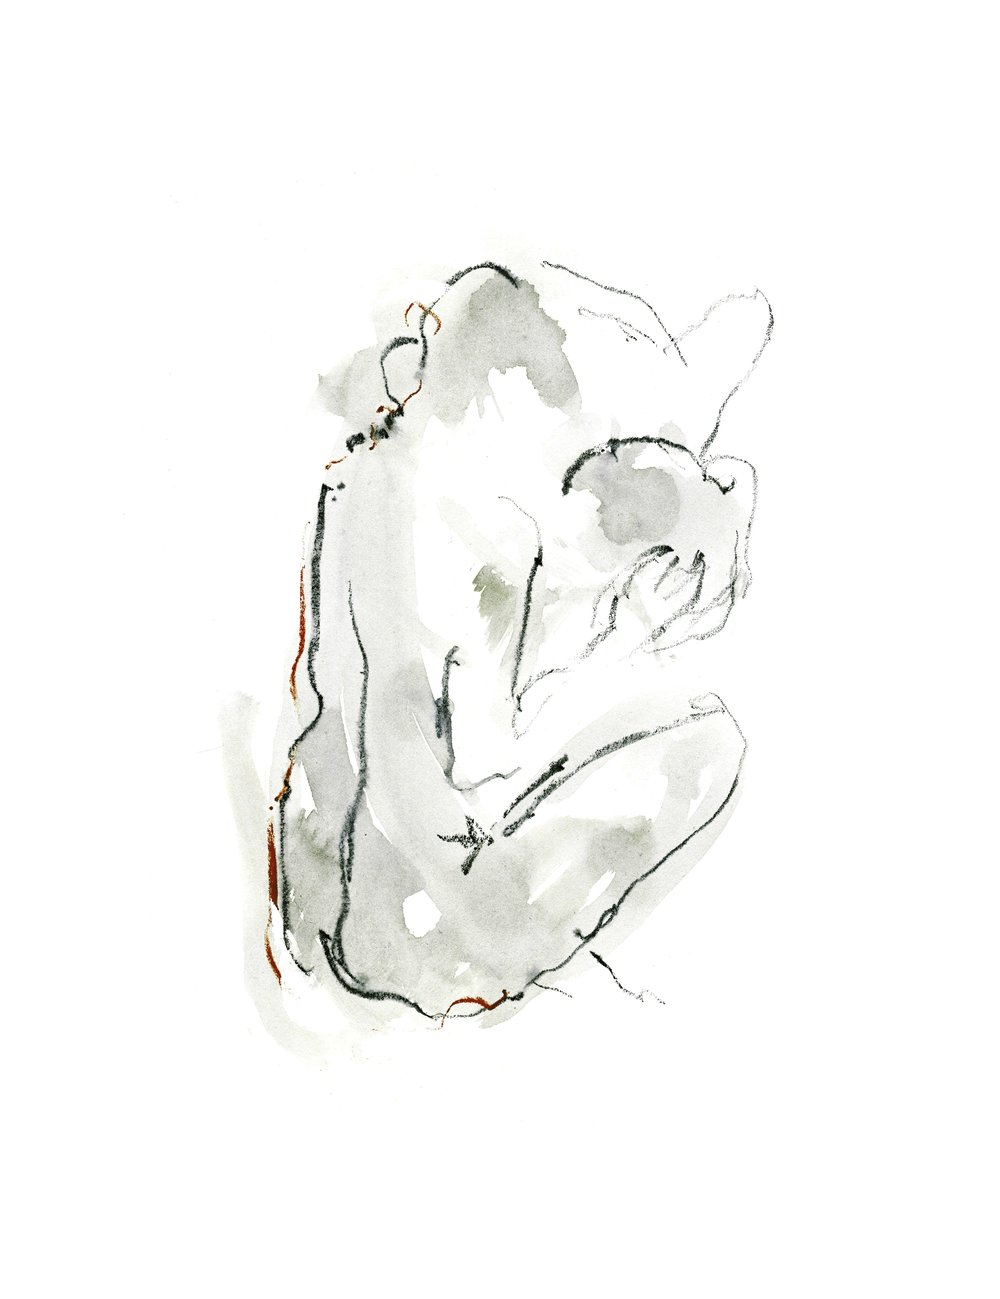 Tender touch David Paynter .jpg